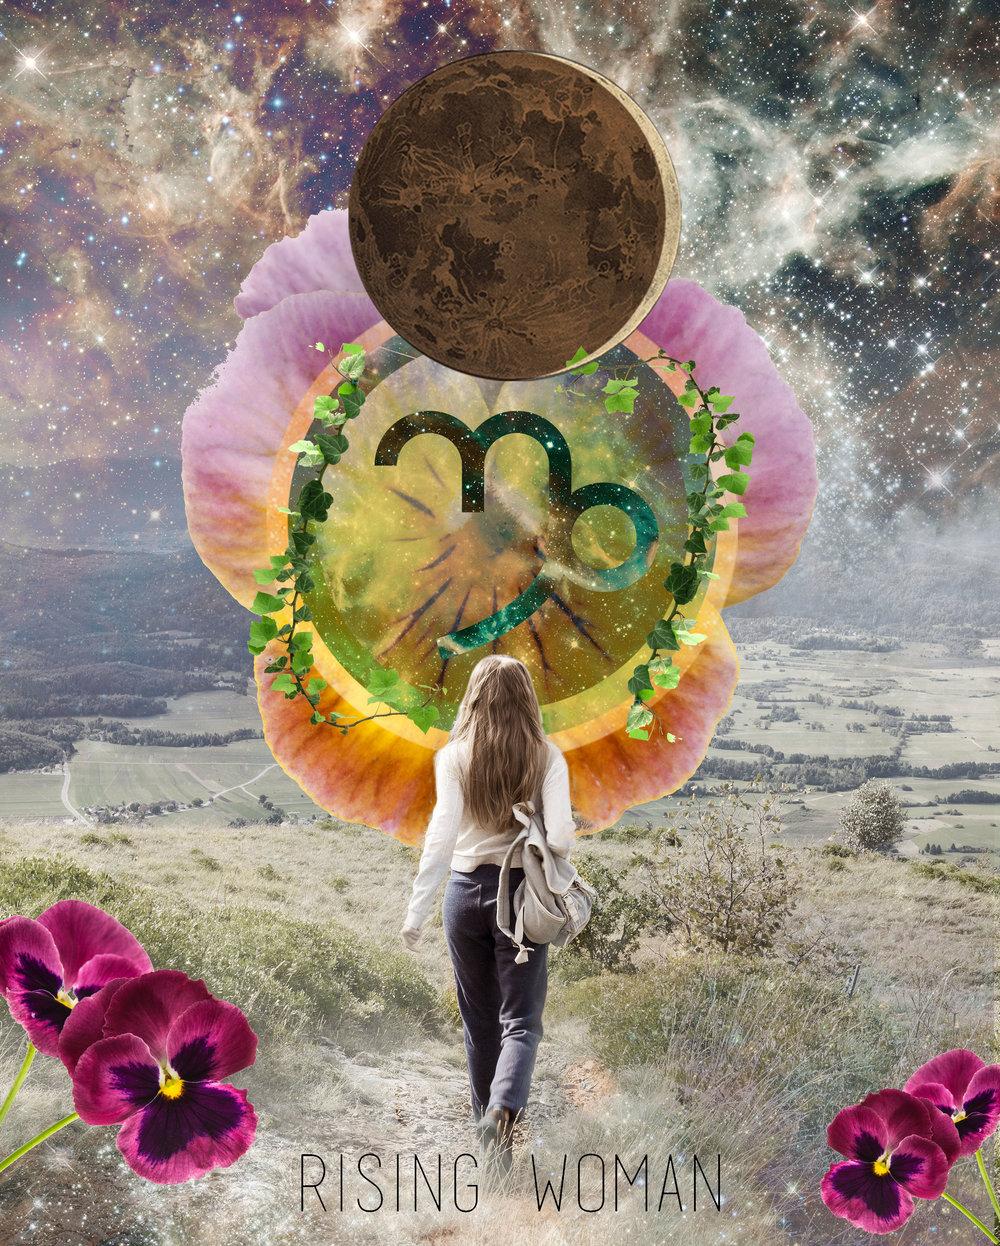 Art by Lori Menna, Cosmic Collage.